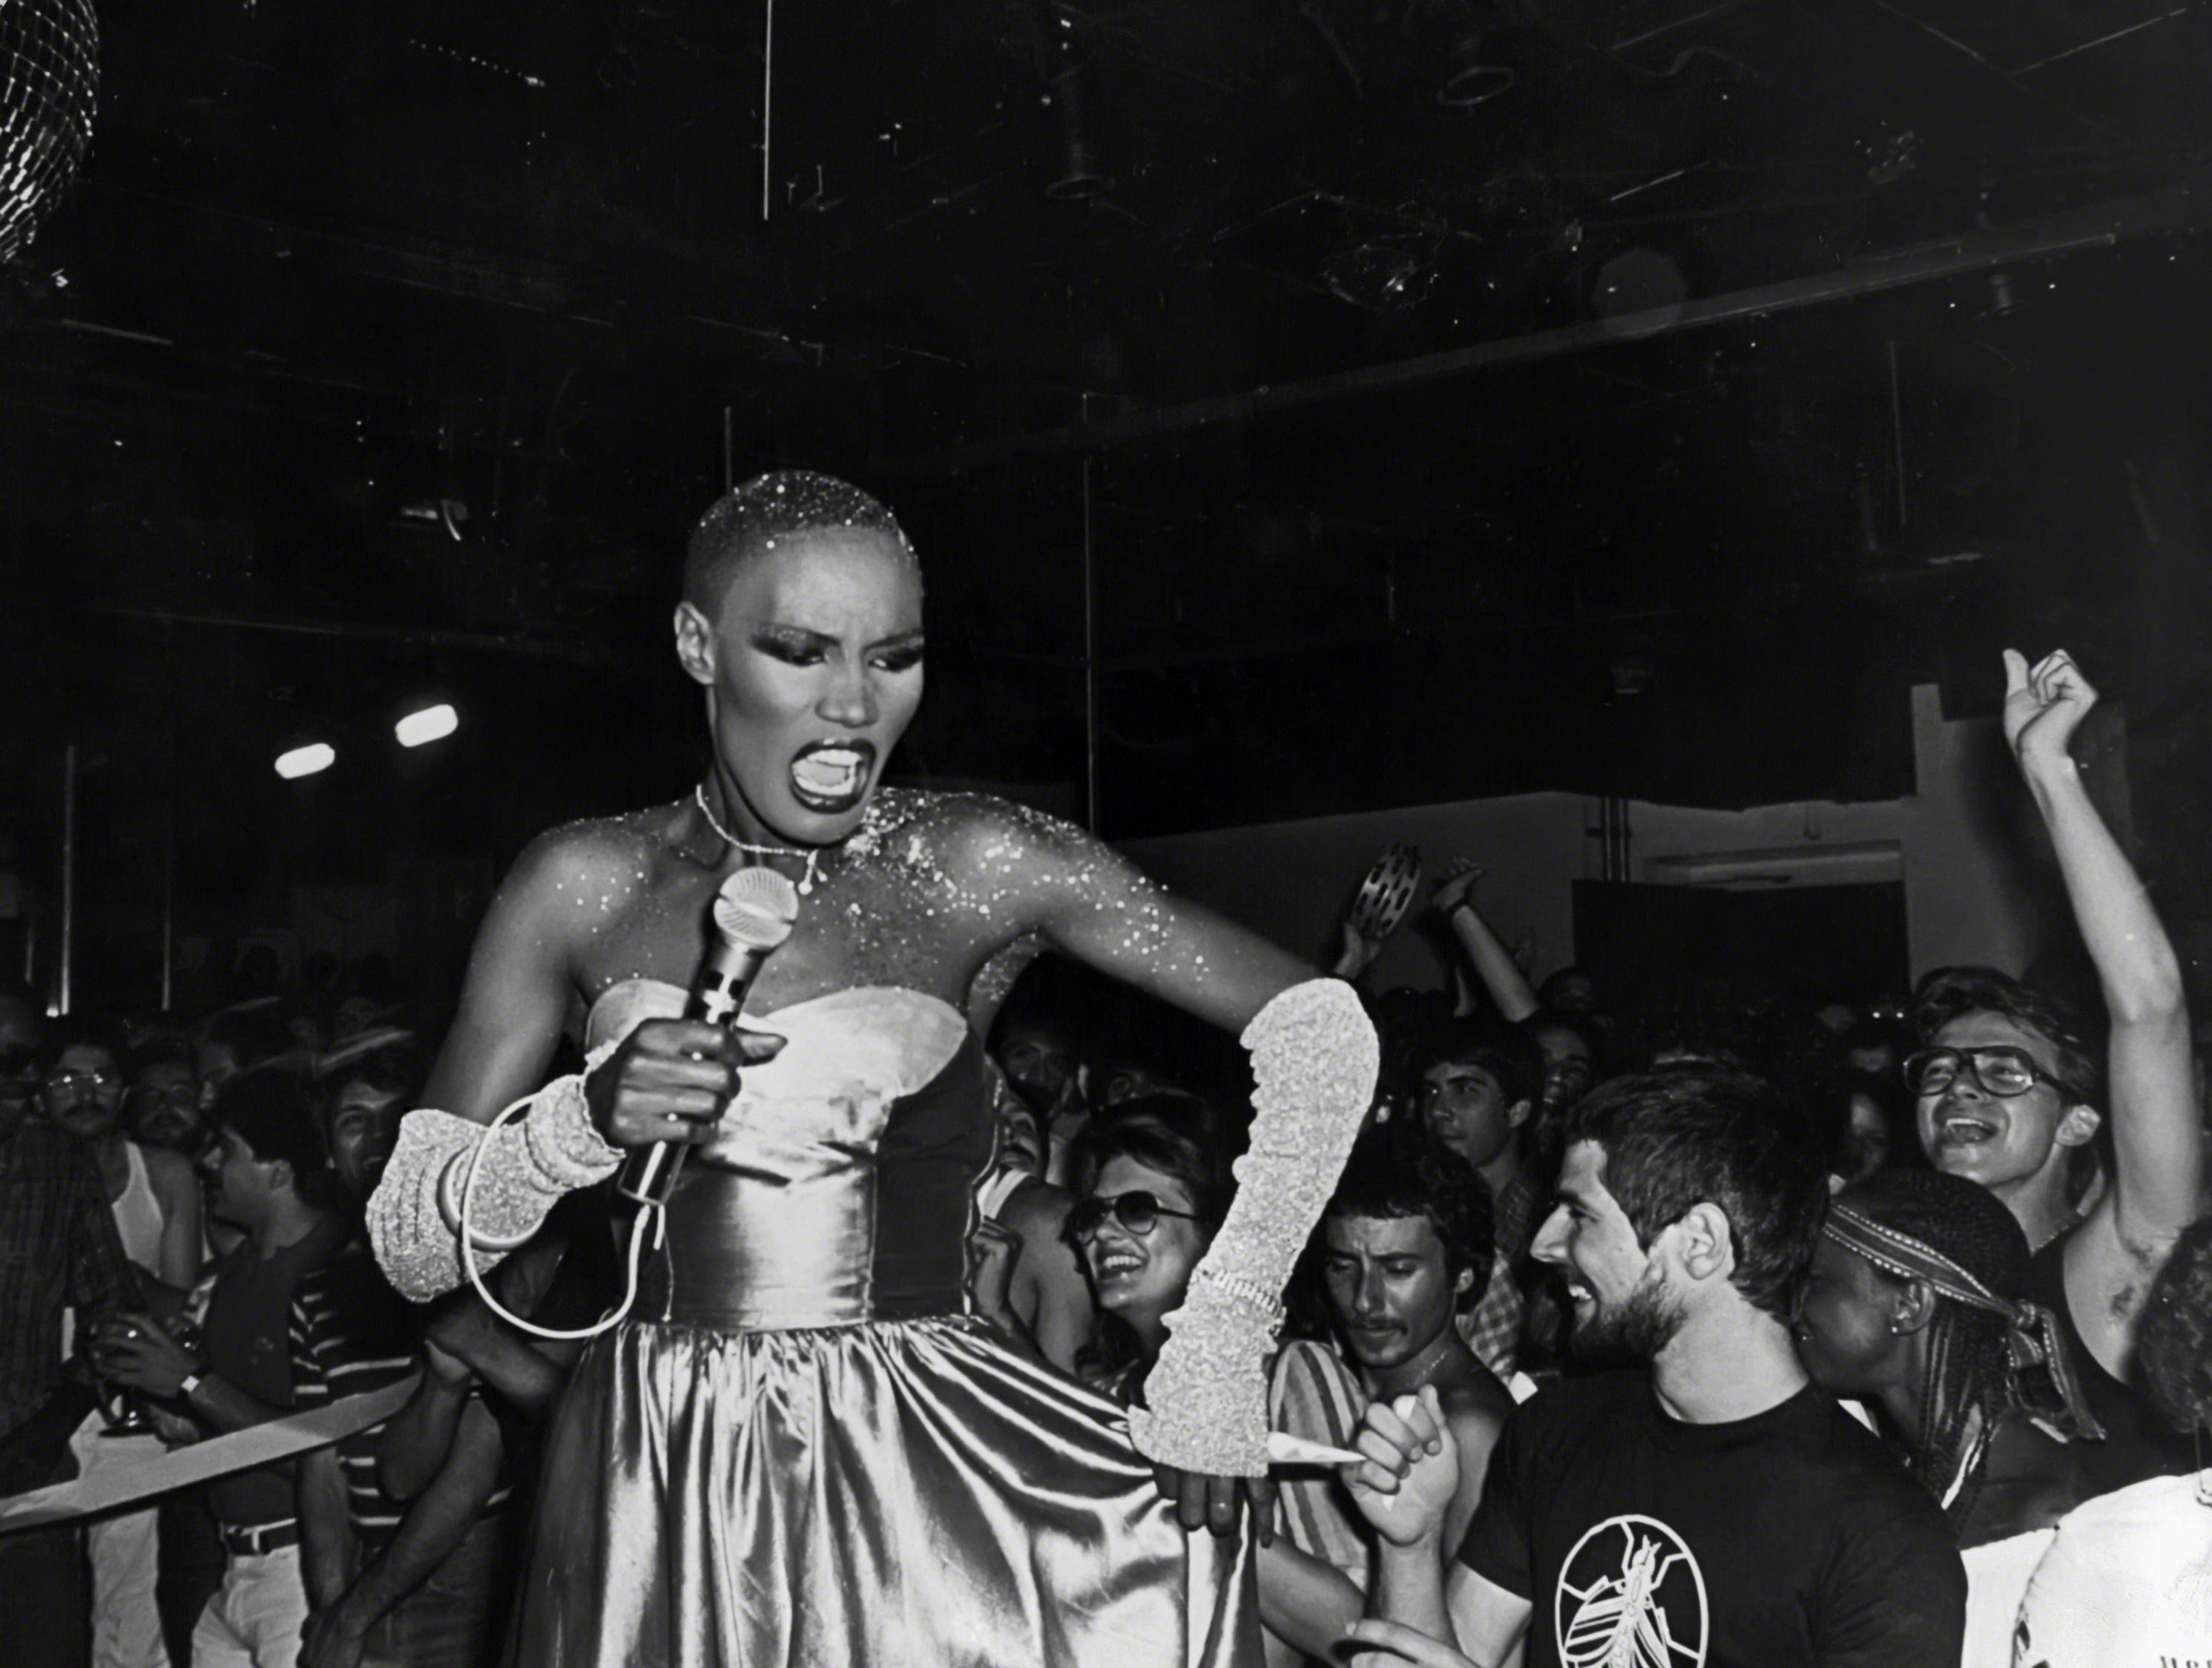 Grace Jones Studio 54 circa 1980 in New York City. Foto Sonia Moskowitz-Getty Images